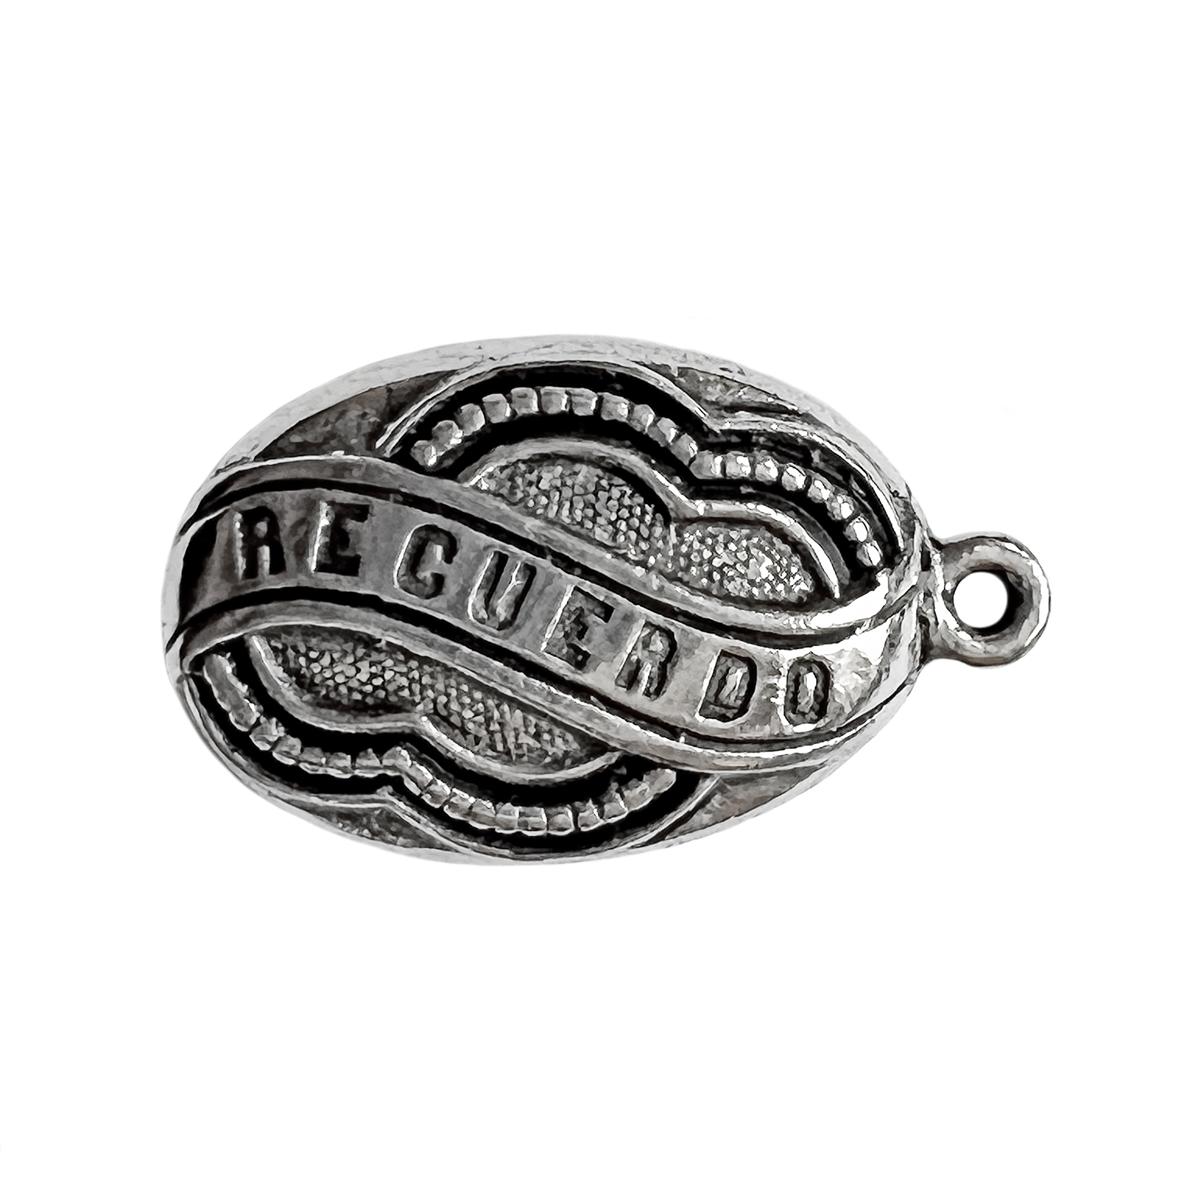 Old silver recuerdo pendant memory pendant antique silver old silver pewter recuerdo memory pendant aloadofball Gallery